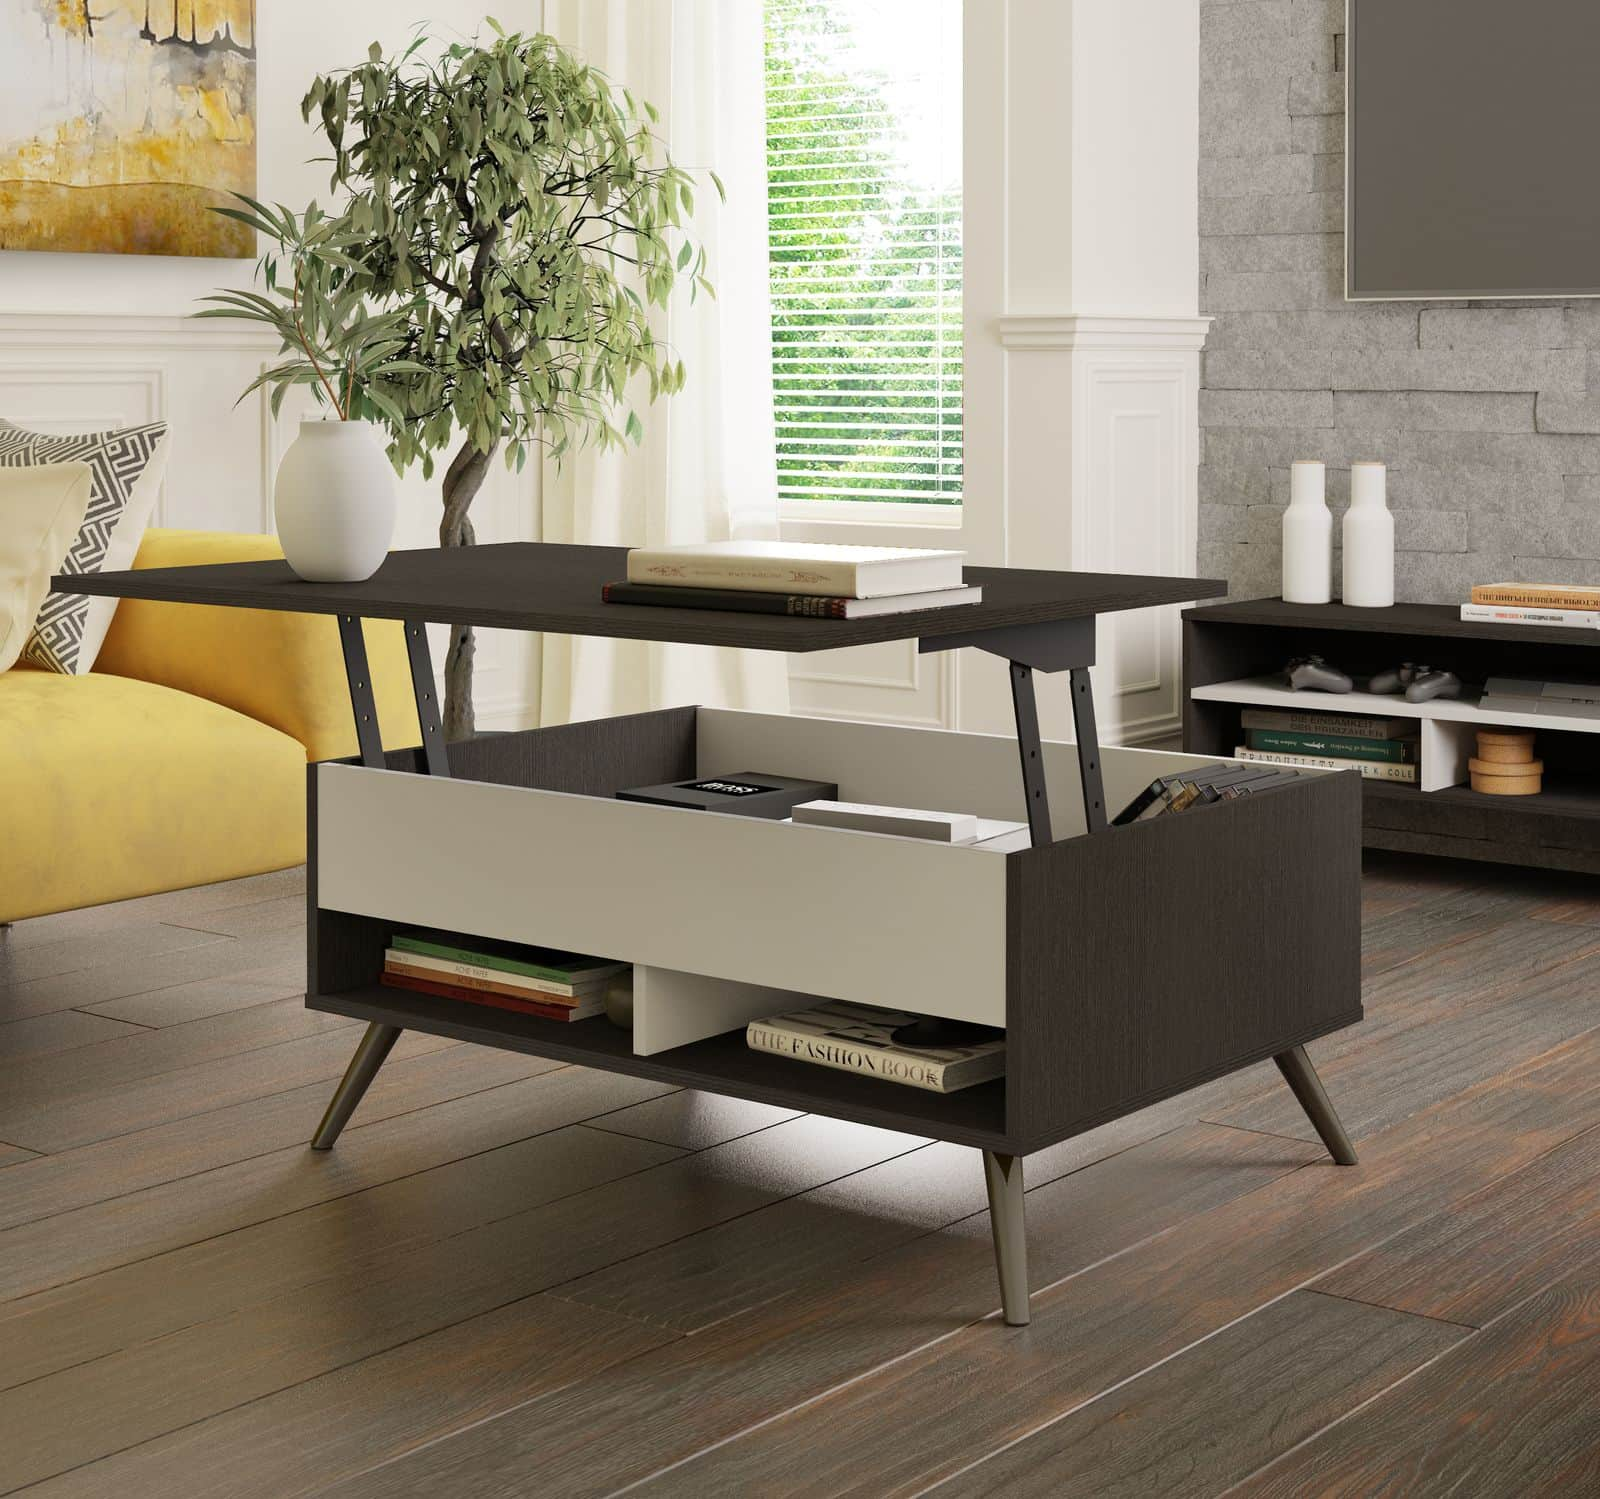 Bestar lift-top coffee table